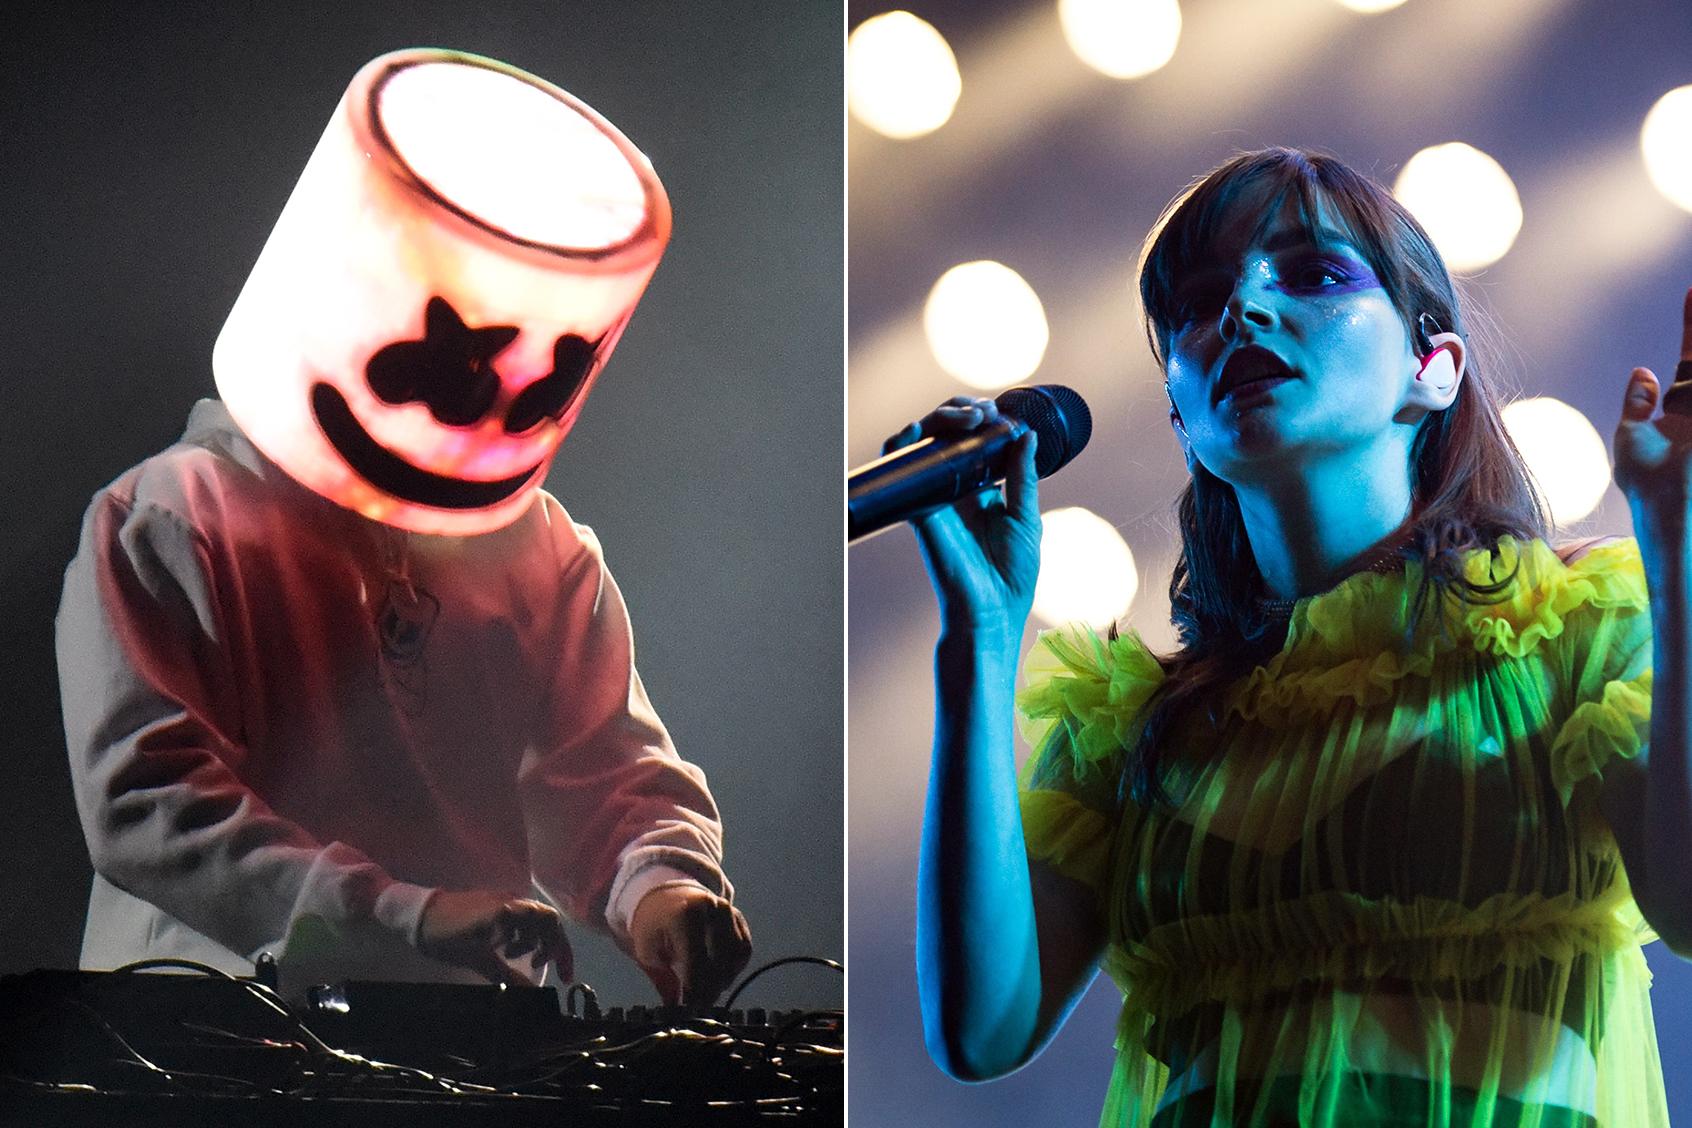 Hear Marshmello Recruit Chvrches for New Song 'Here With Me' - KSPN